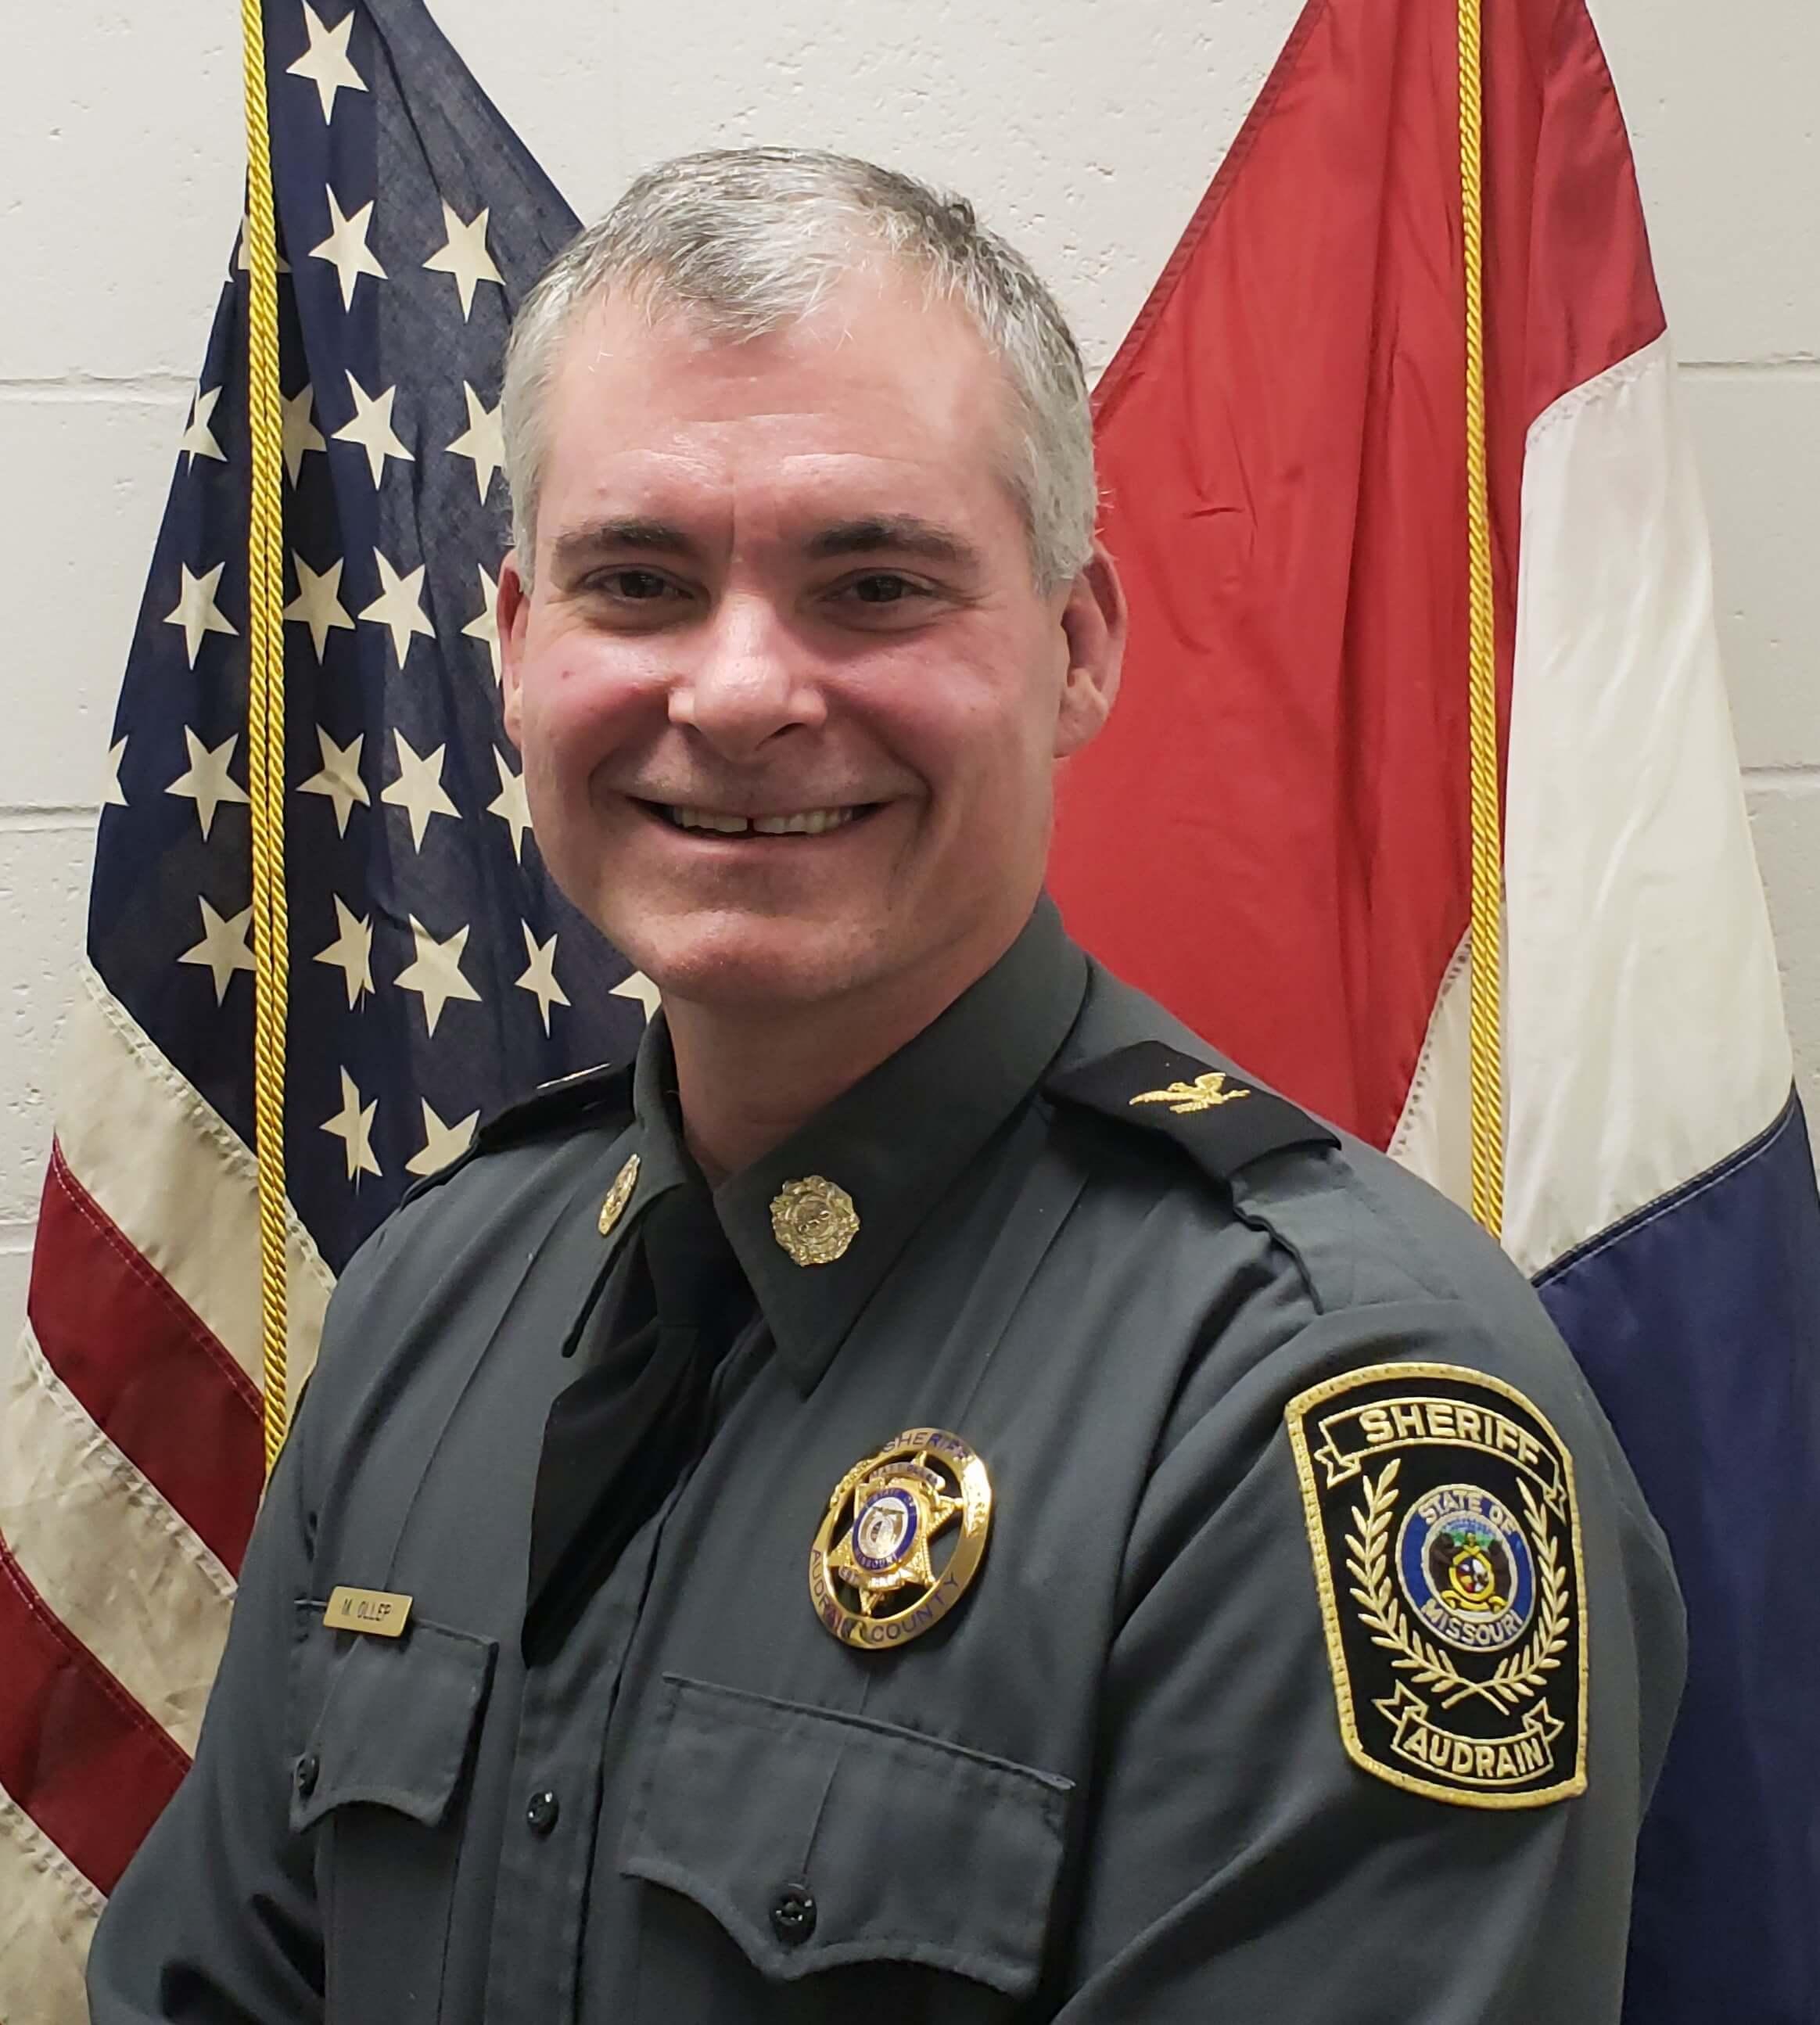 Matt Oller, Audrain county sheriff